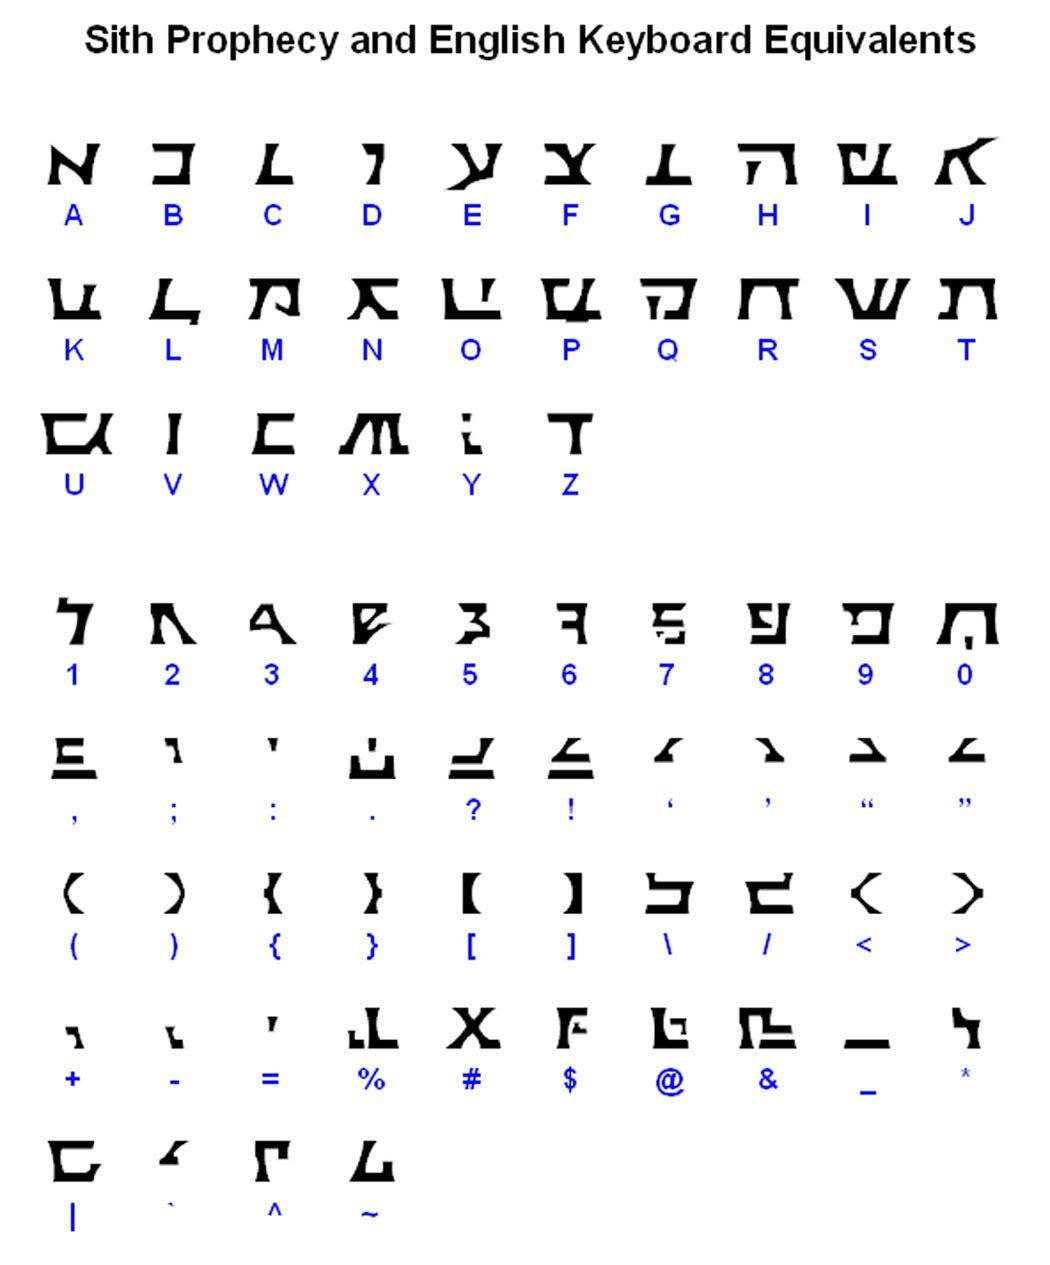 Star wars symbols | Languages in Star Wars - Wikipedia, the free ...